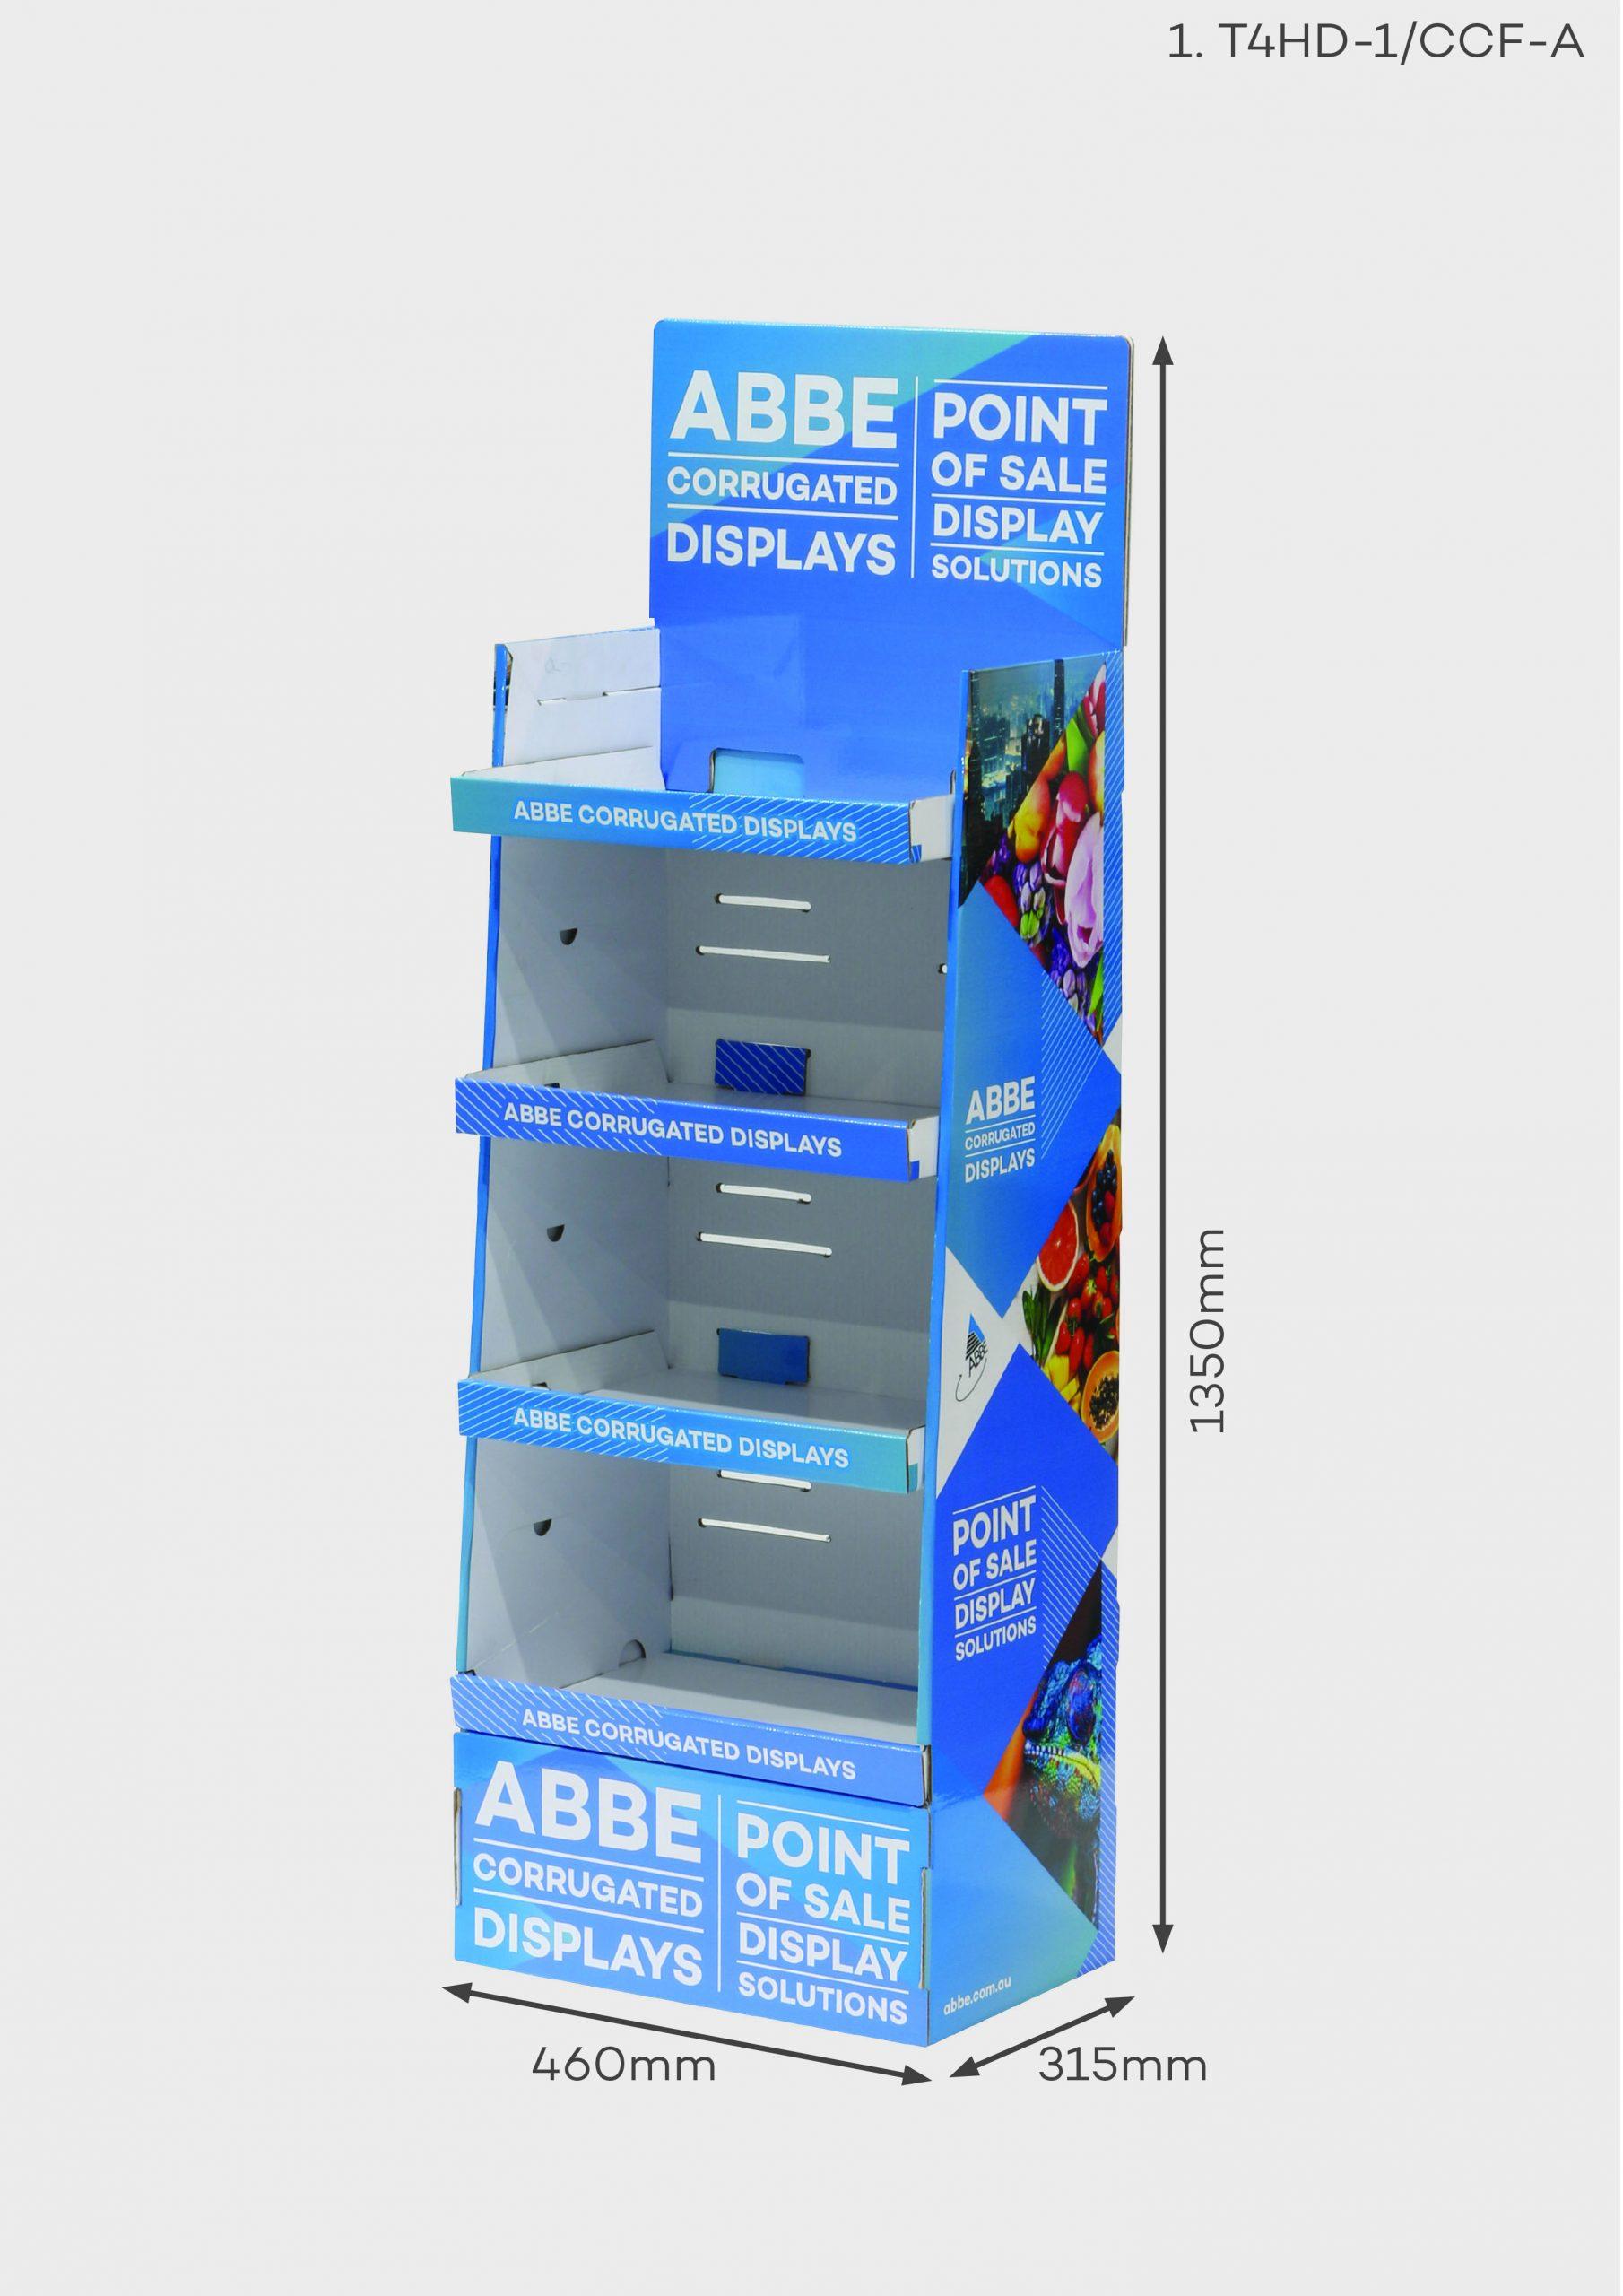 4 Shelf Medium Display Unit (Ref T4HD-1/CCF-A)